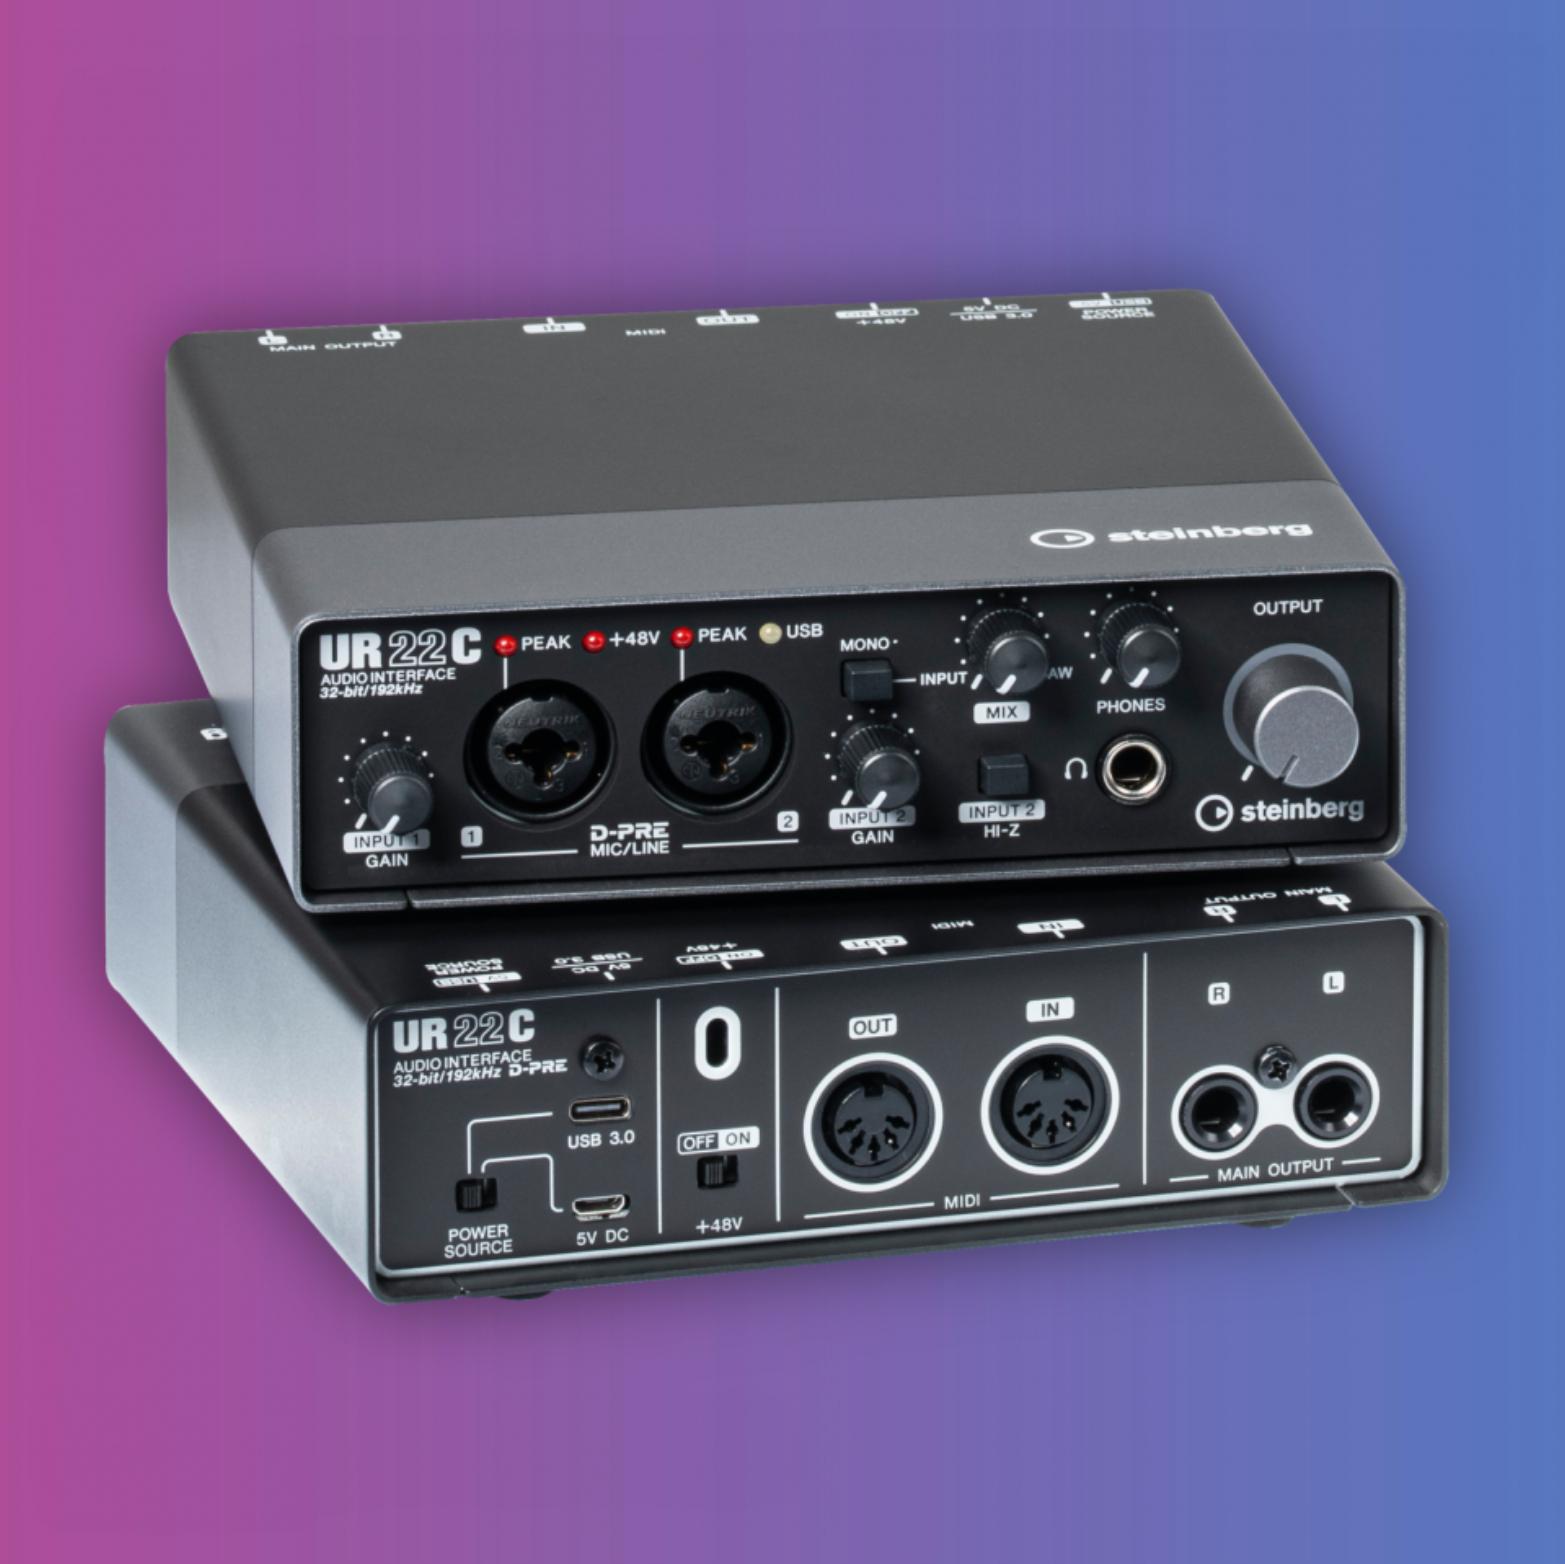 Steinberg UR22C: USB Audio-Interface (32Bit / 192kHz, 2x Mikrofon Verstärker, 2x Line Ein-/Ausgang, DSP, MIDI)